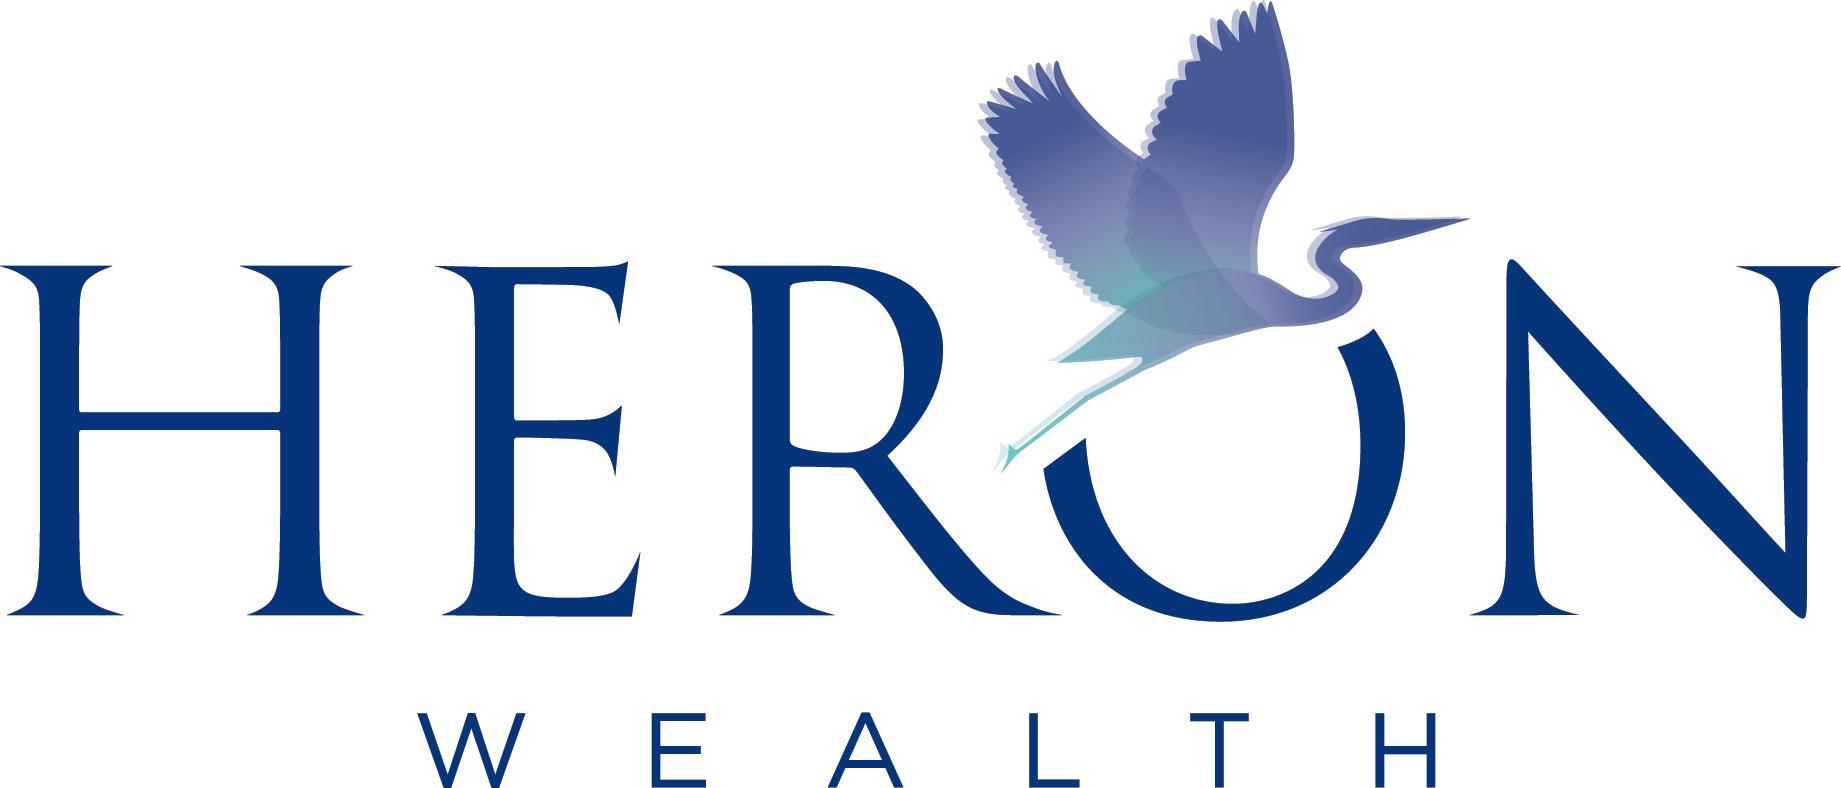 Heron Wealth image 4